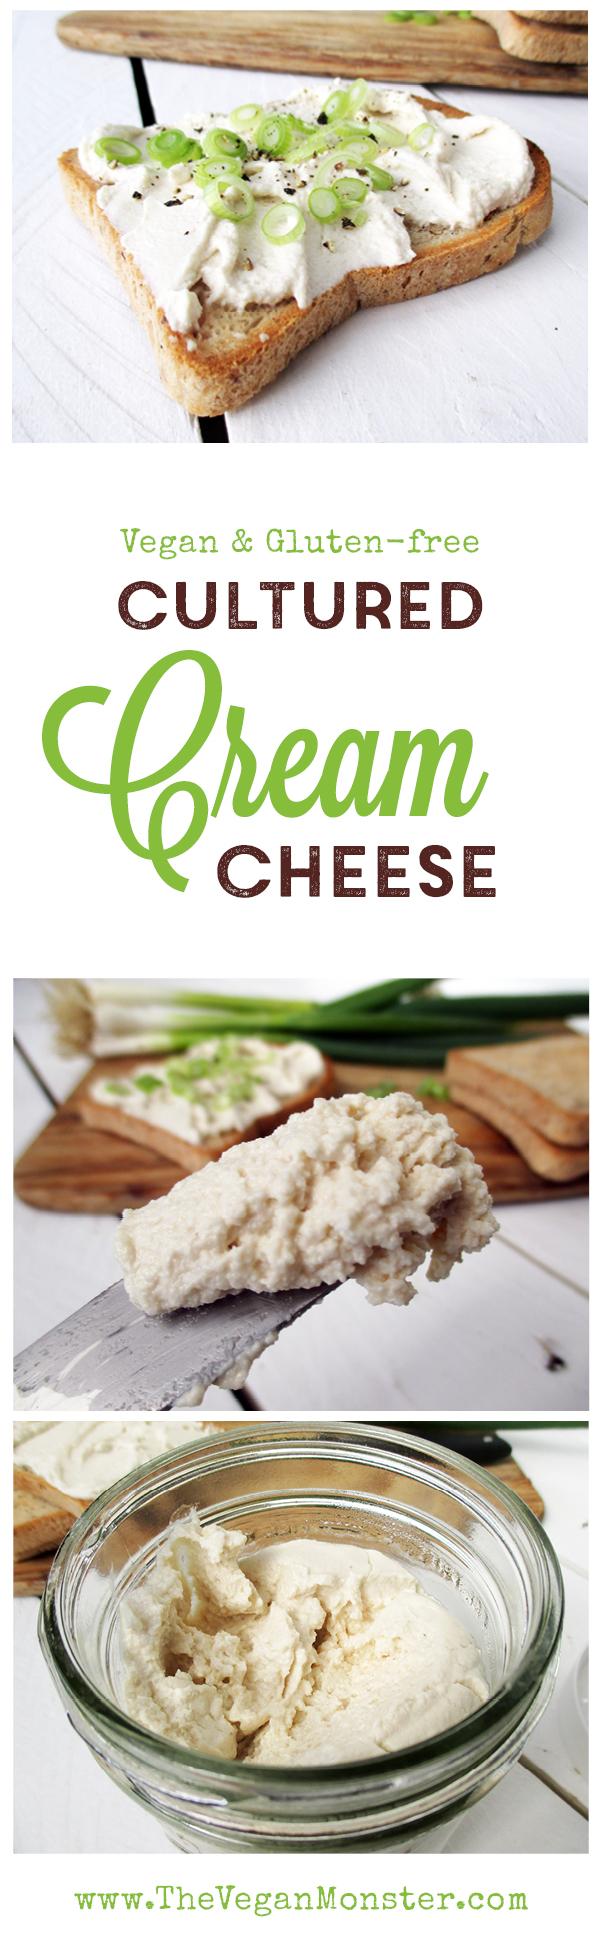 Vegan Gluten-free Dairy-free Soy-free Cultured Cashew Cream Cheese Recipe Streickaese Rezept